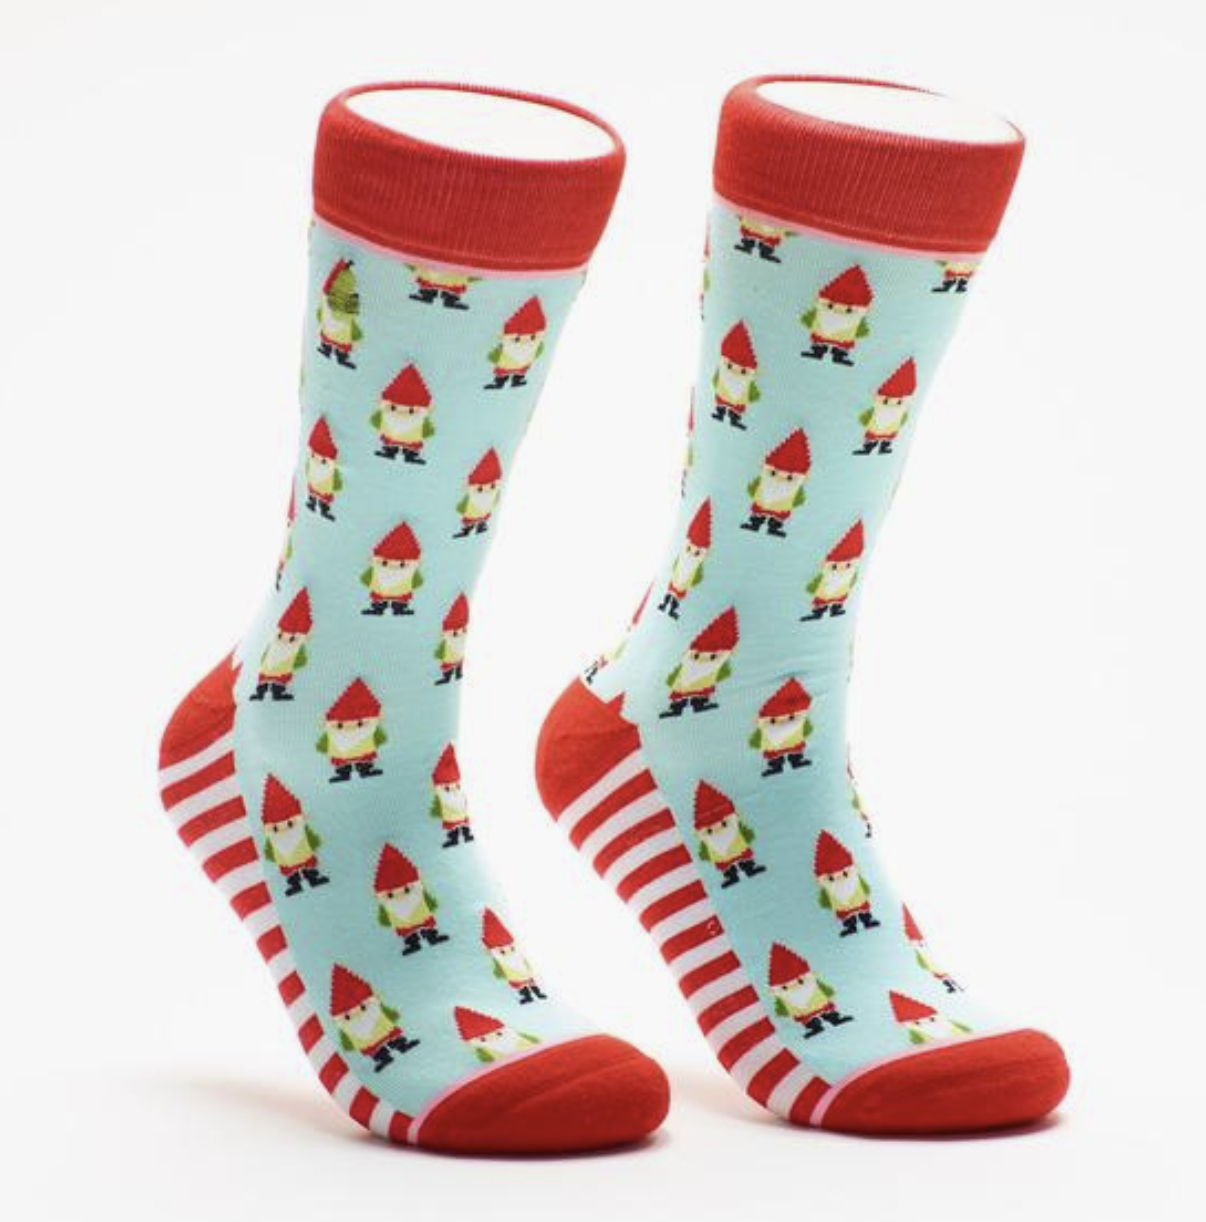 Woven Pear Garden Gnomes Crew Socks